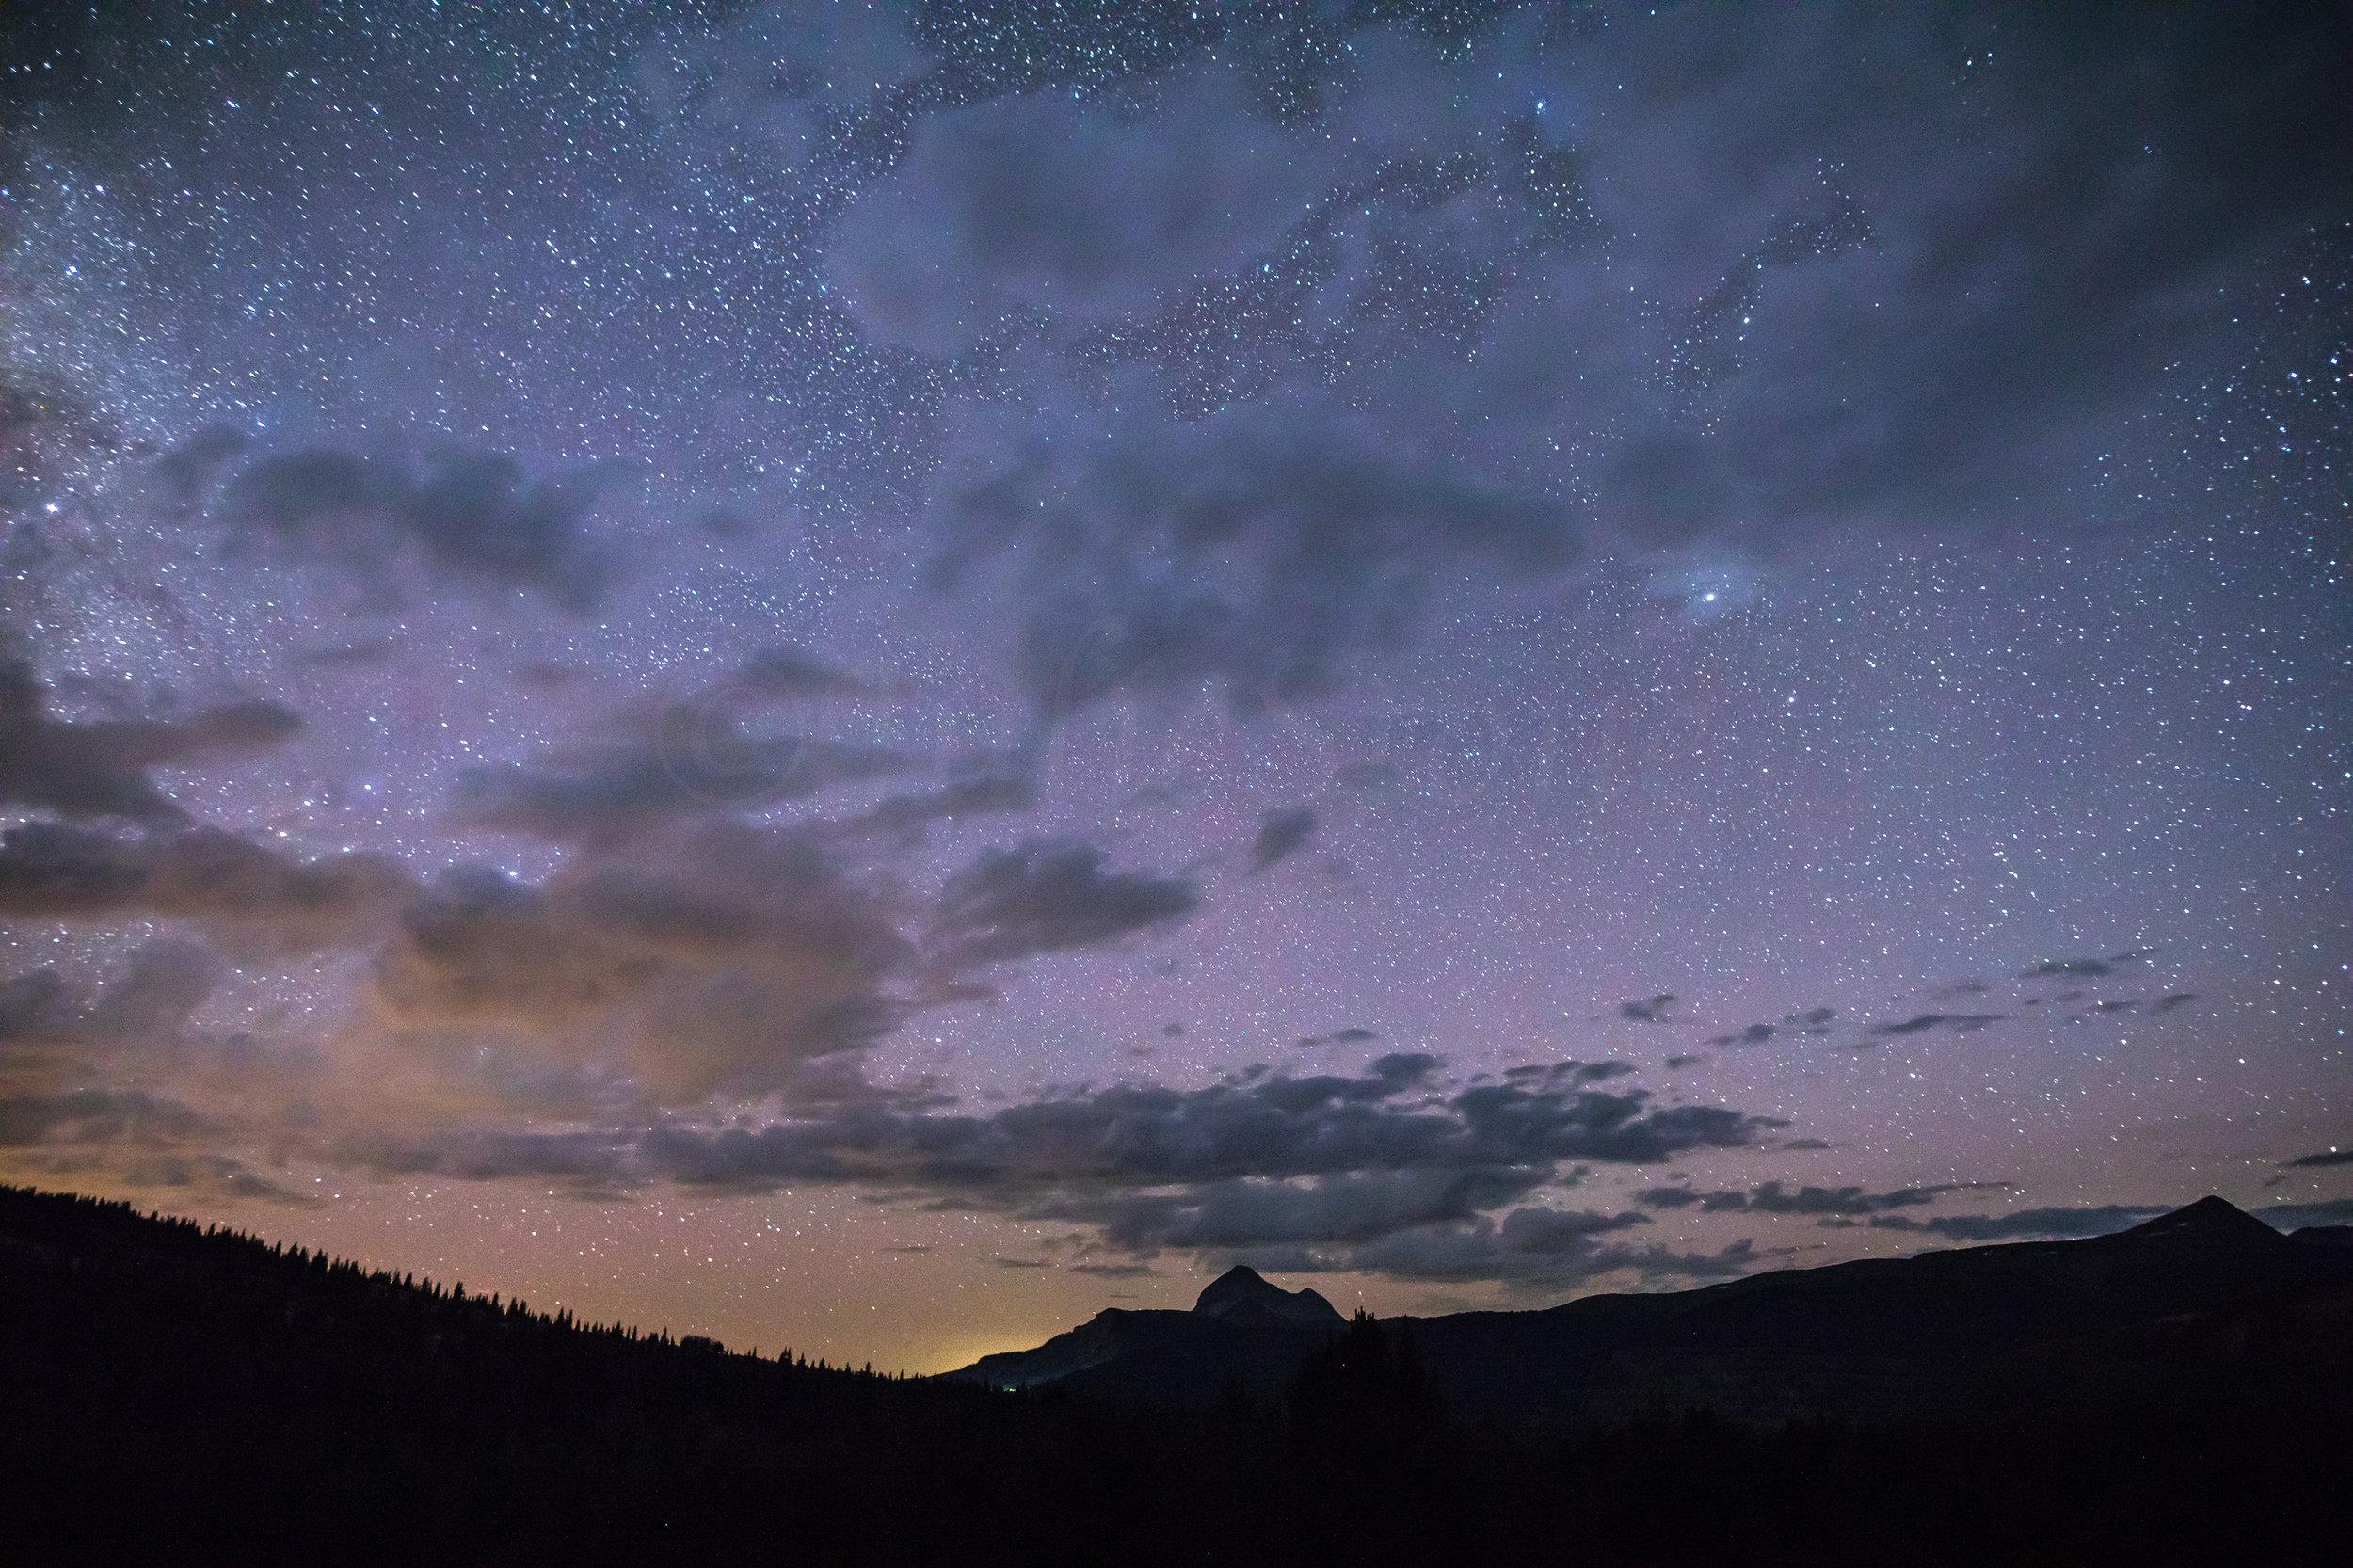 Engineer Mountain Milky Way, Image # 7493